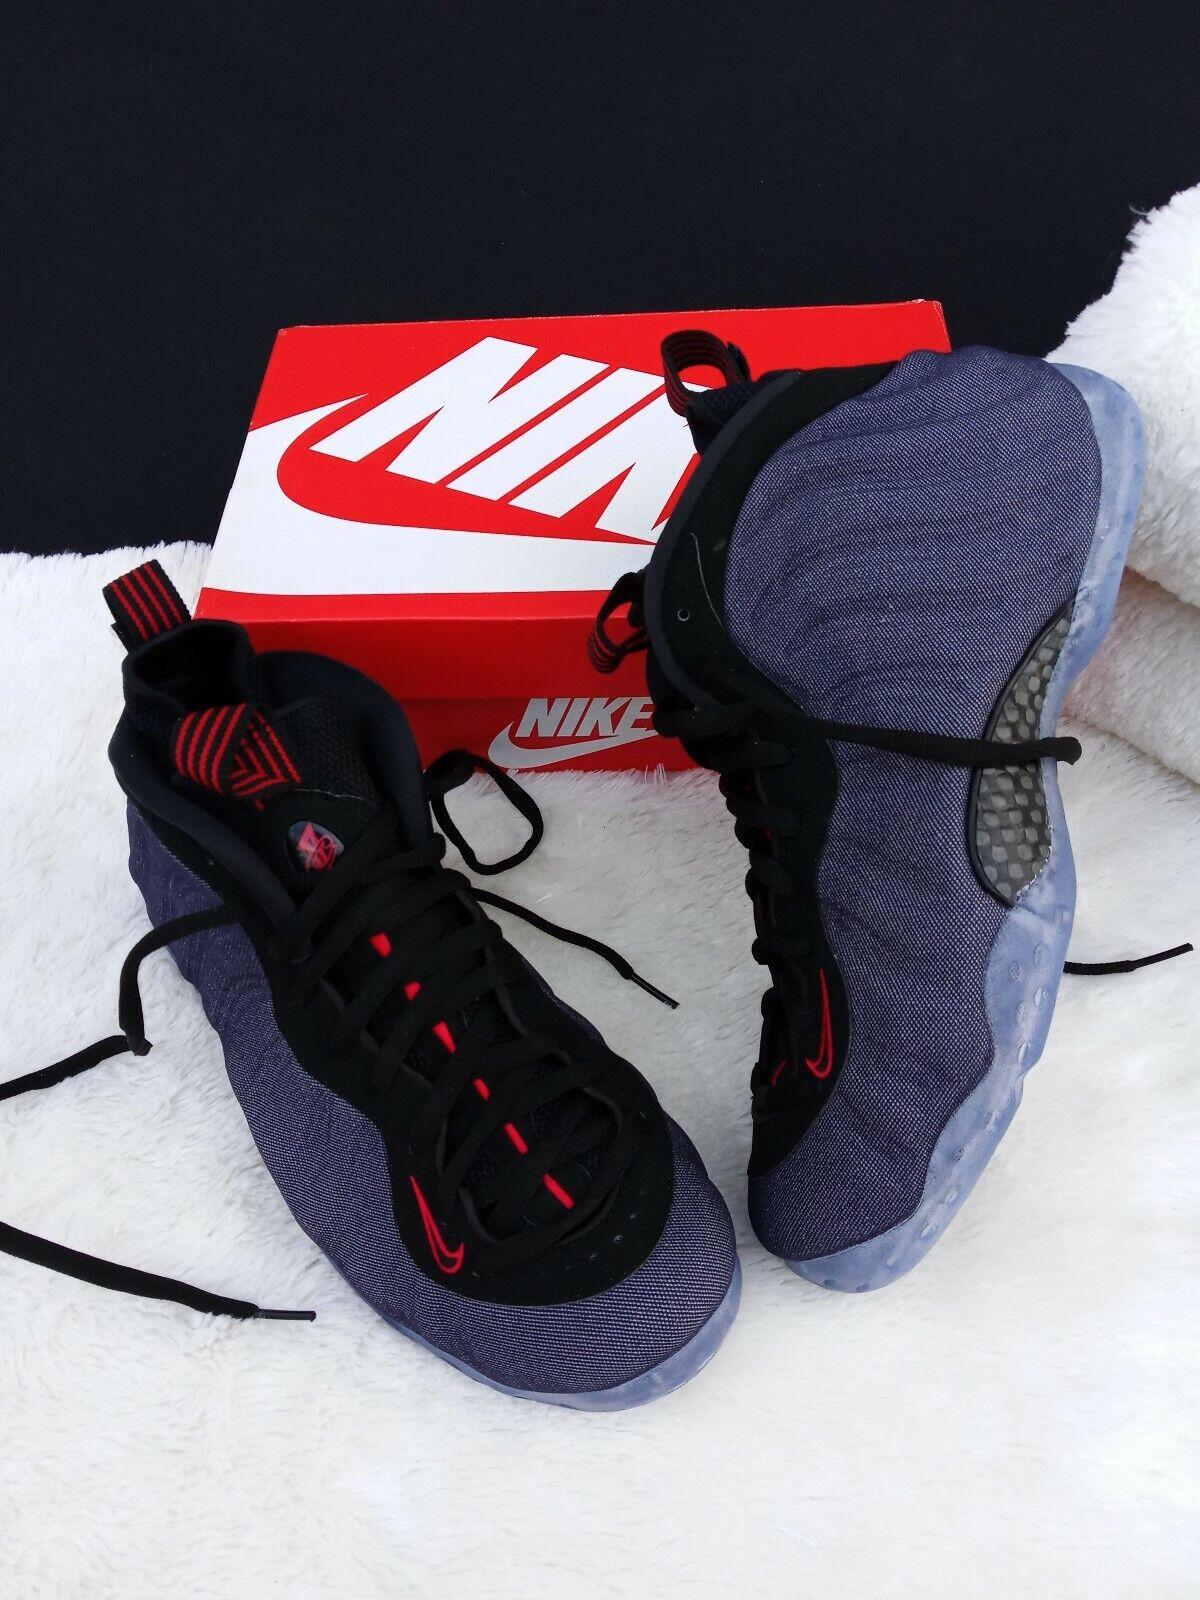 detailed look 18a0c 6eb5b ... SIZE 11 MEN S Nike Air Foamposite One Denim Denim Denim Obsidian Black  314996 404 SNEAKERS af1e11 ...